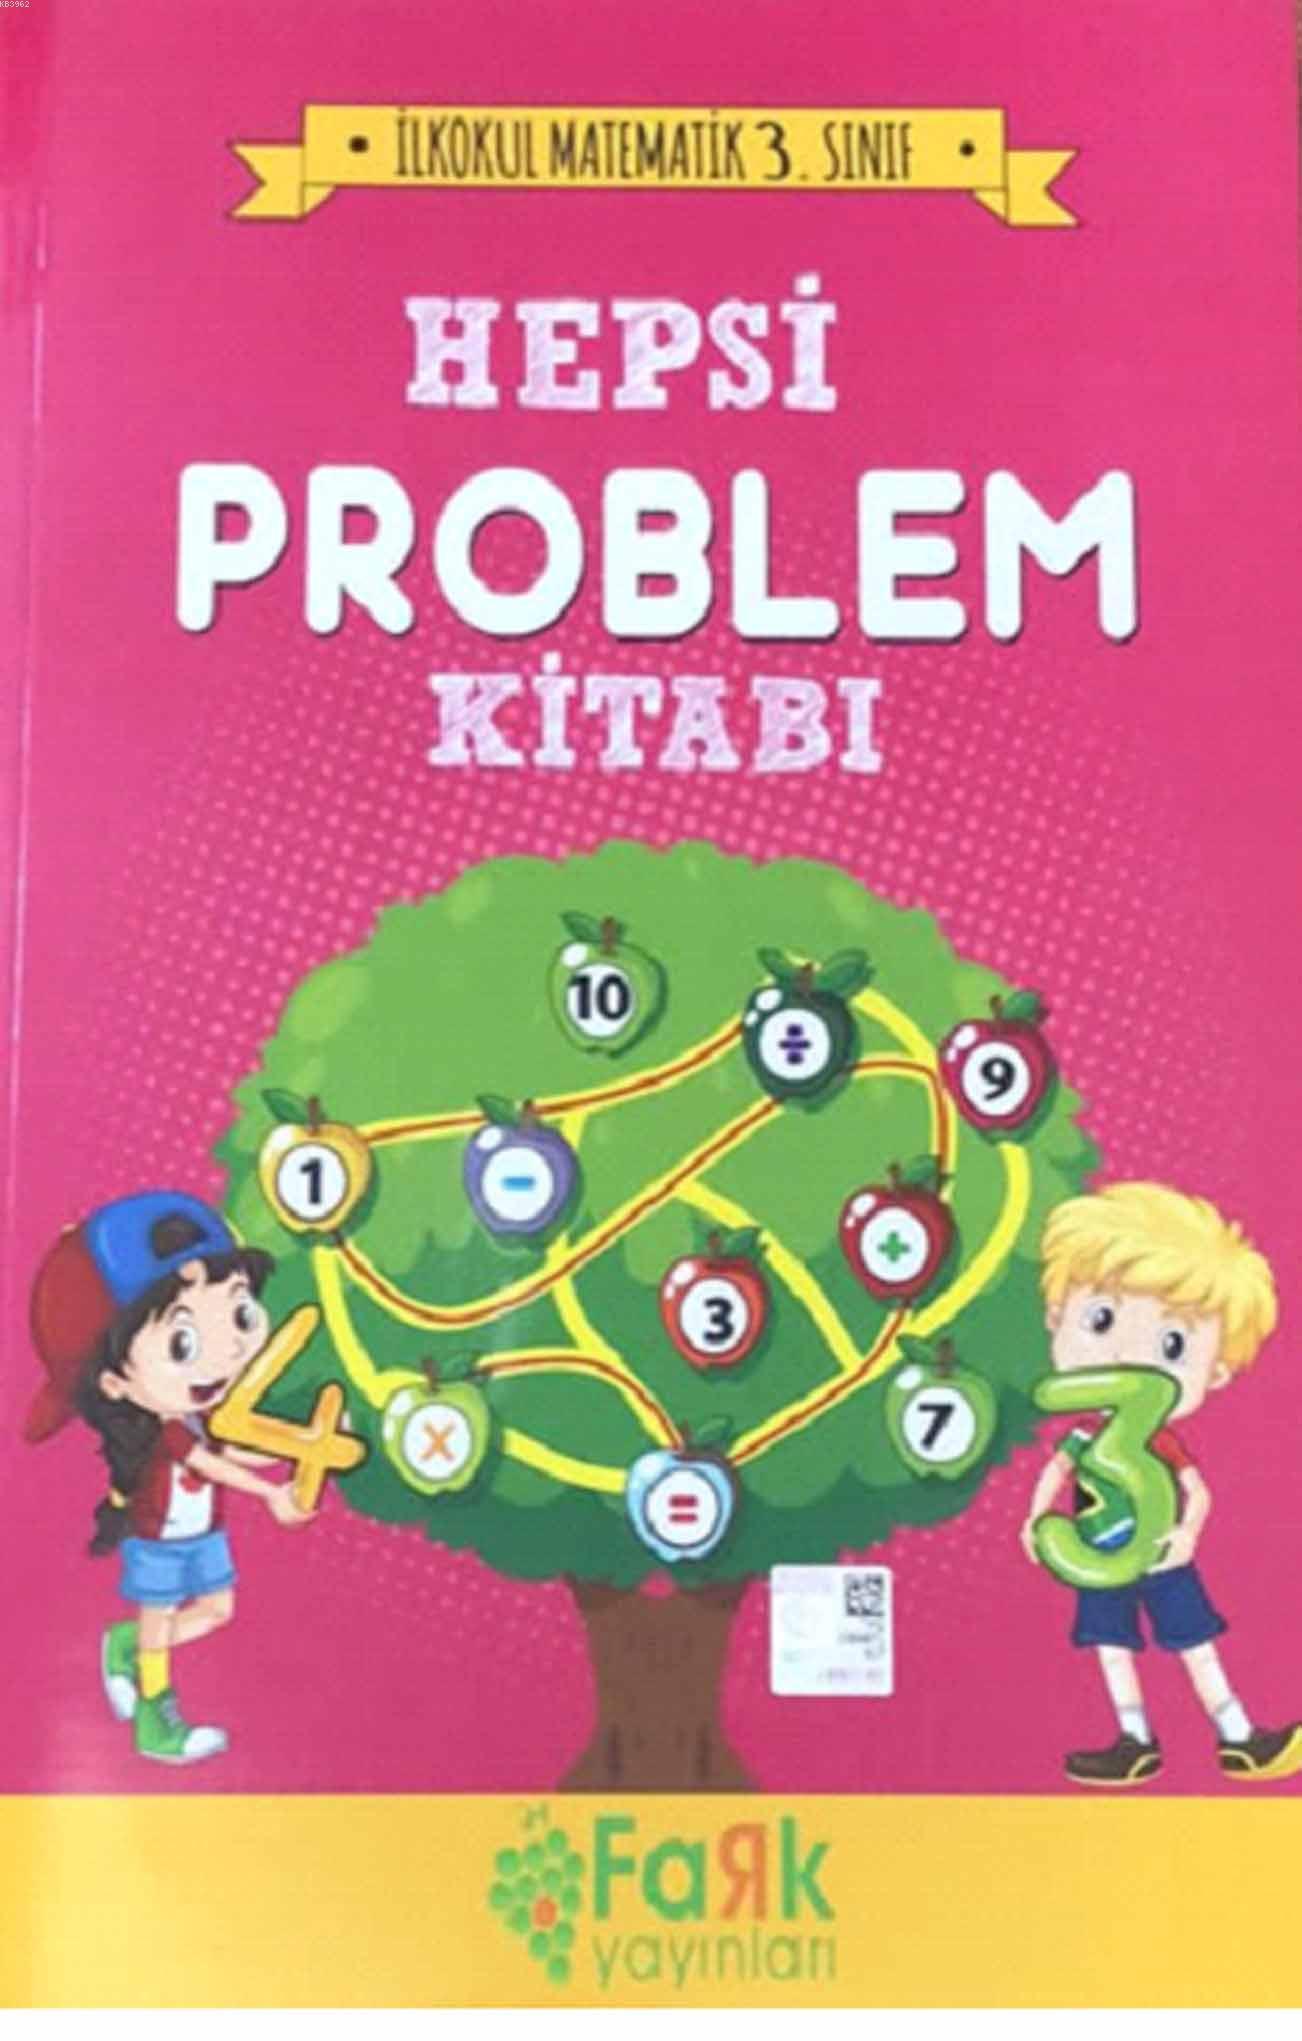 Hepsi Problem - 3